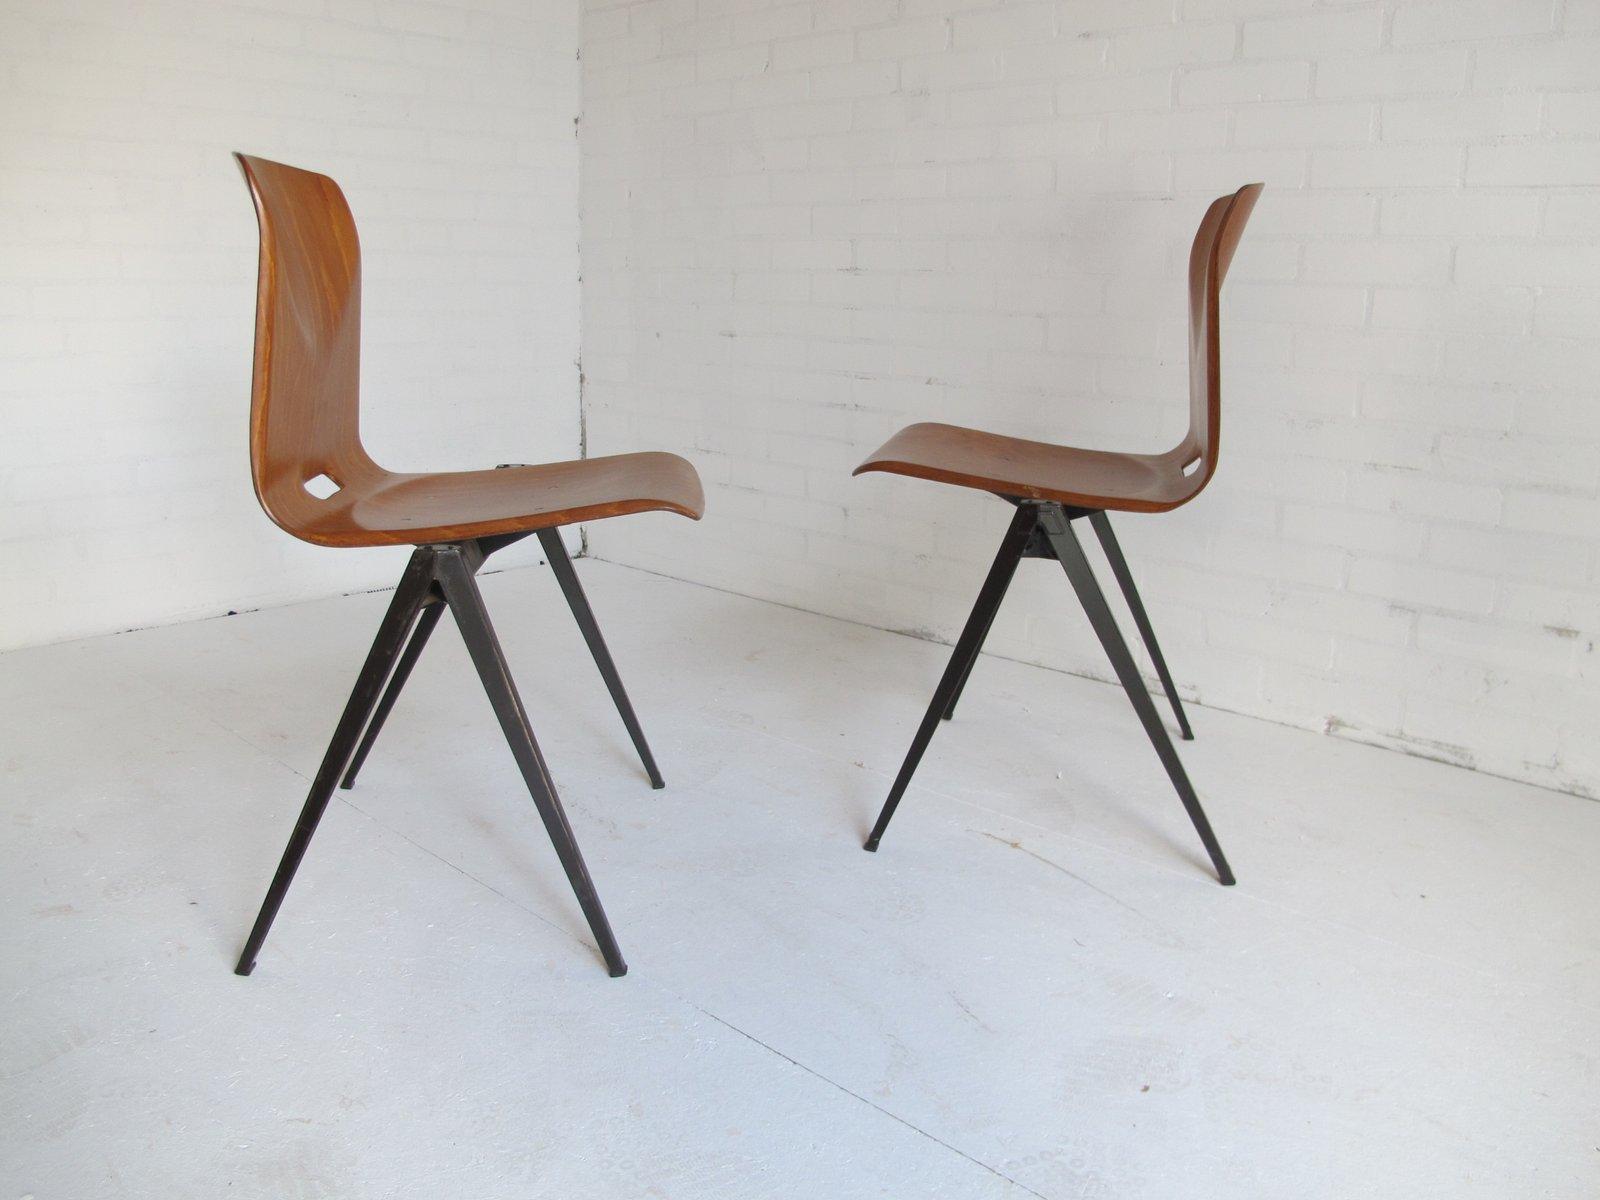 industrielle vintage esszimmerst hle von galvanitas 1967. Black Bedroom Furniture Sets. Home Design Ideas